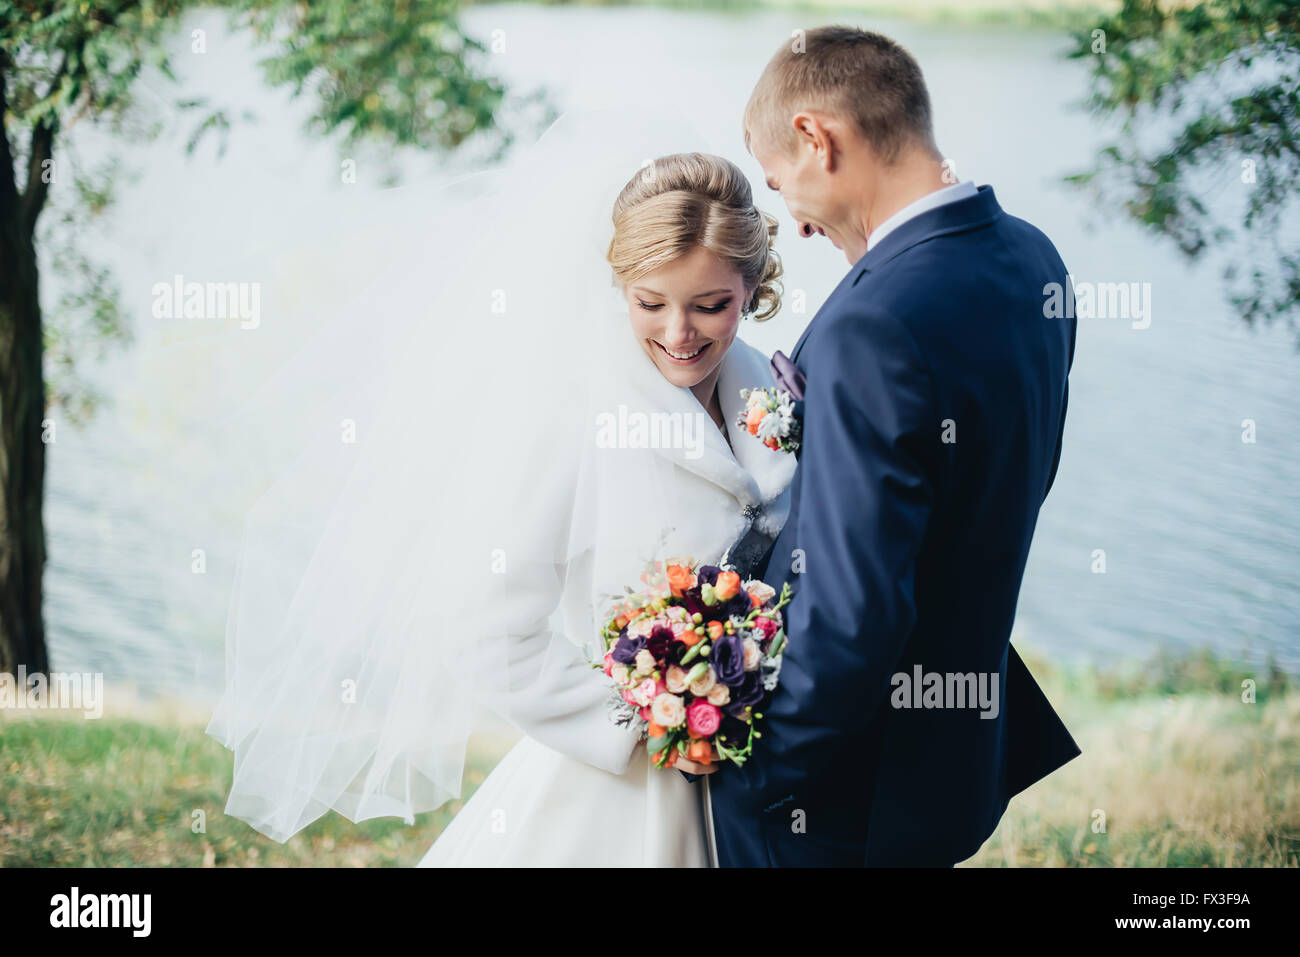 Bride Veils Stockfotos & Bride Veils Bilder - Alamy